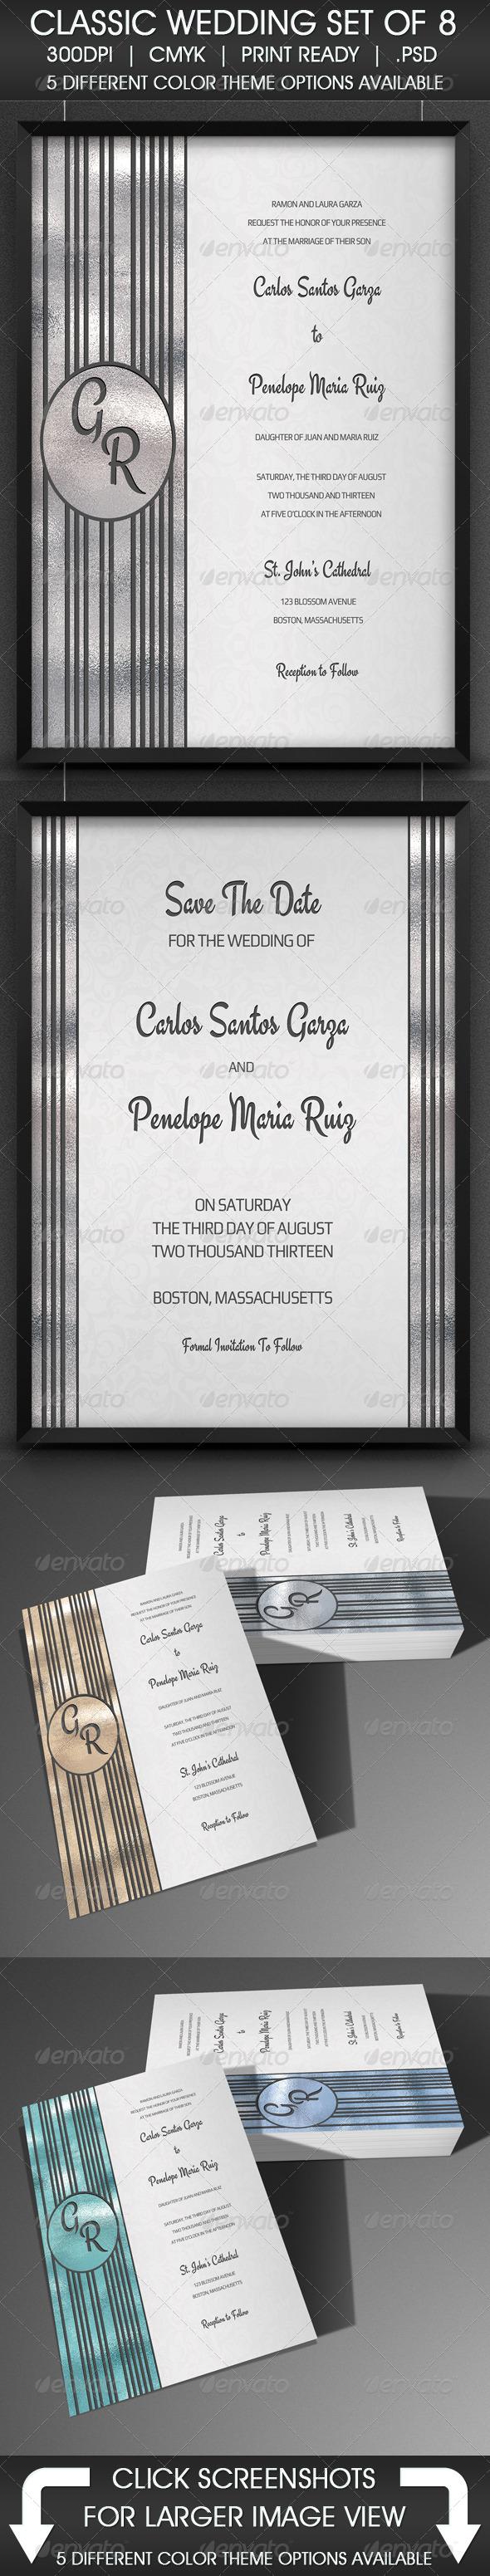 Classic Wedding Set of 8 - Weddings Cards & Invites